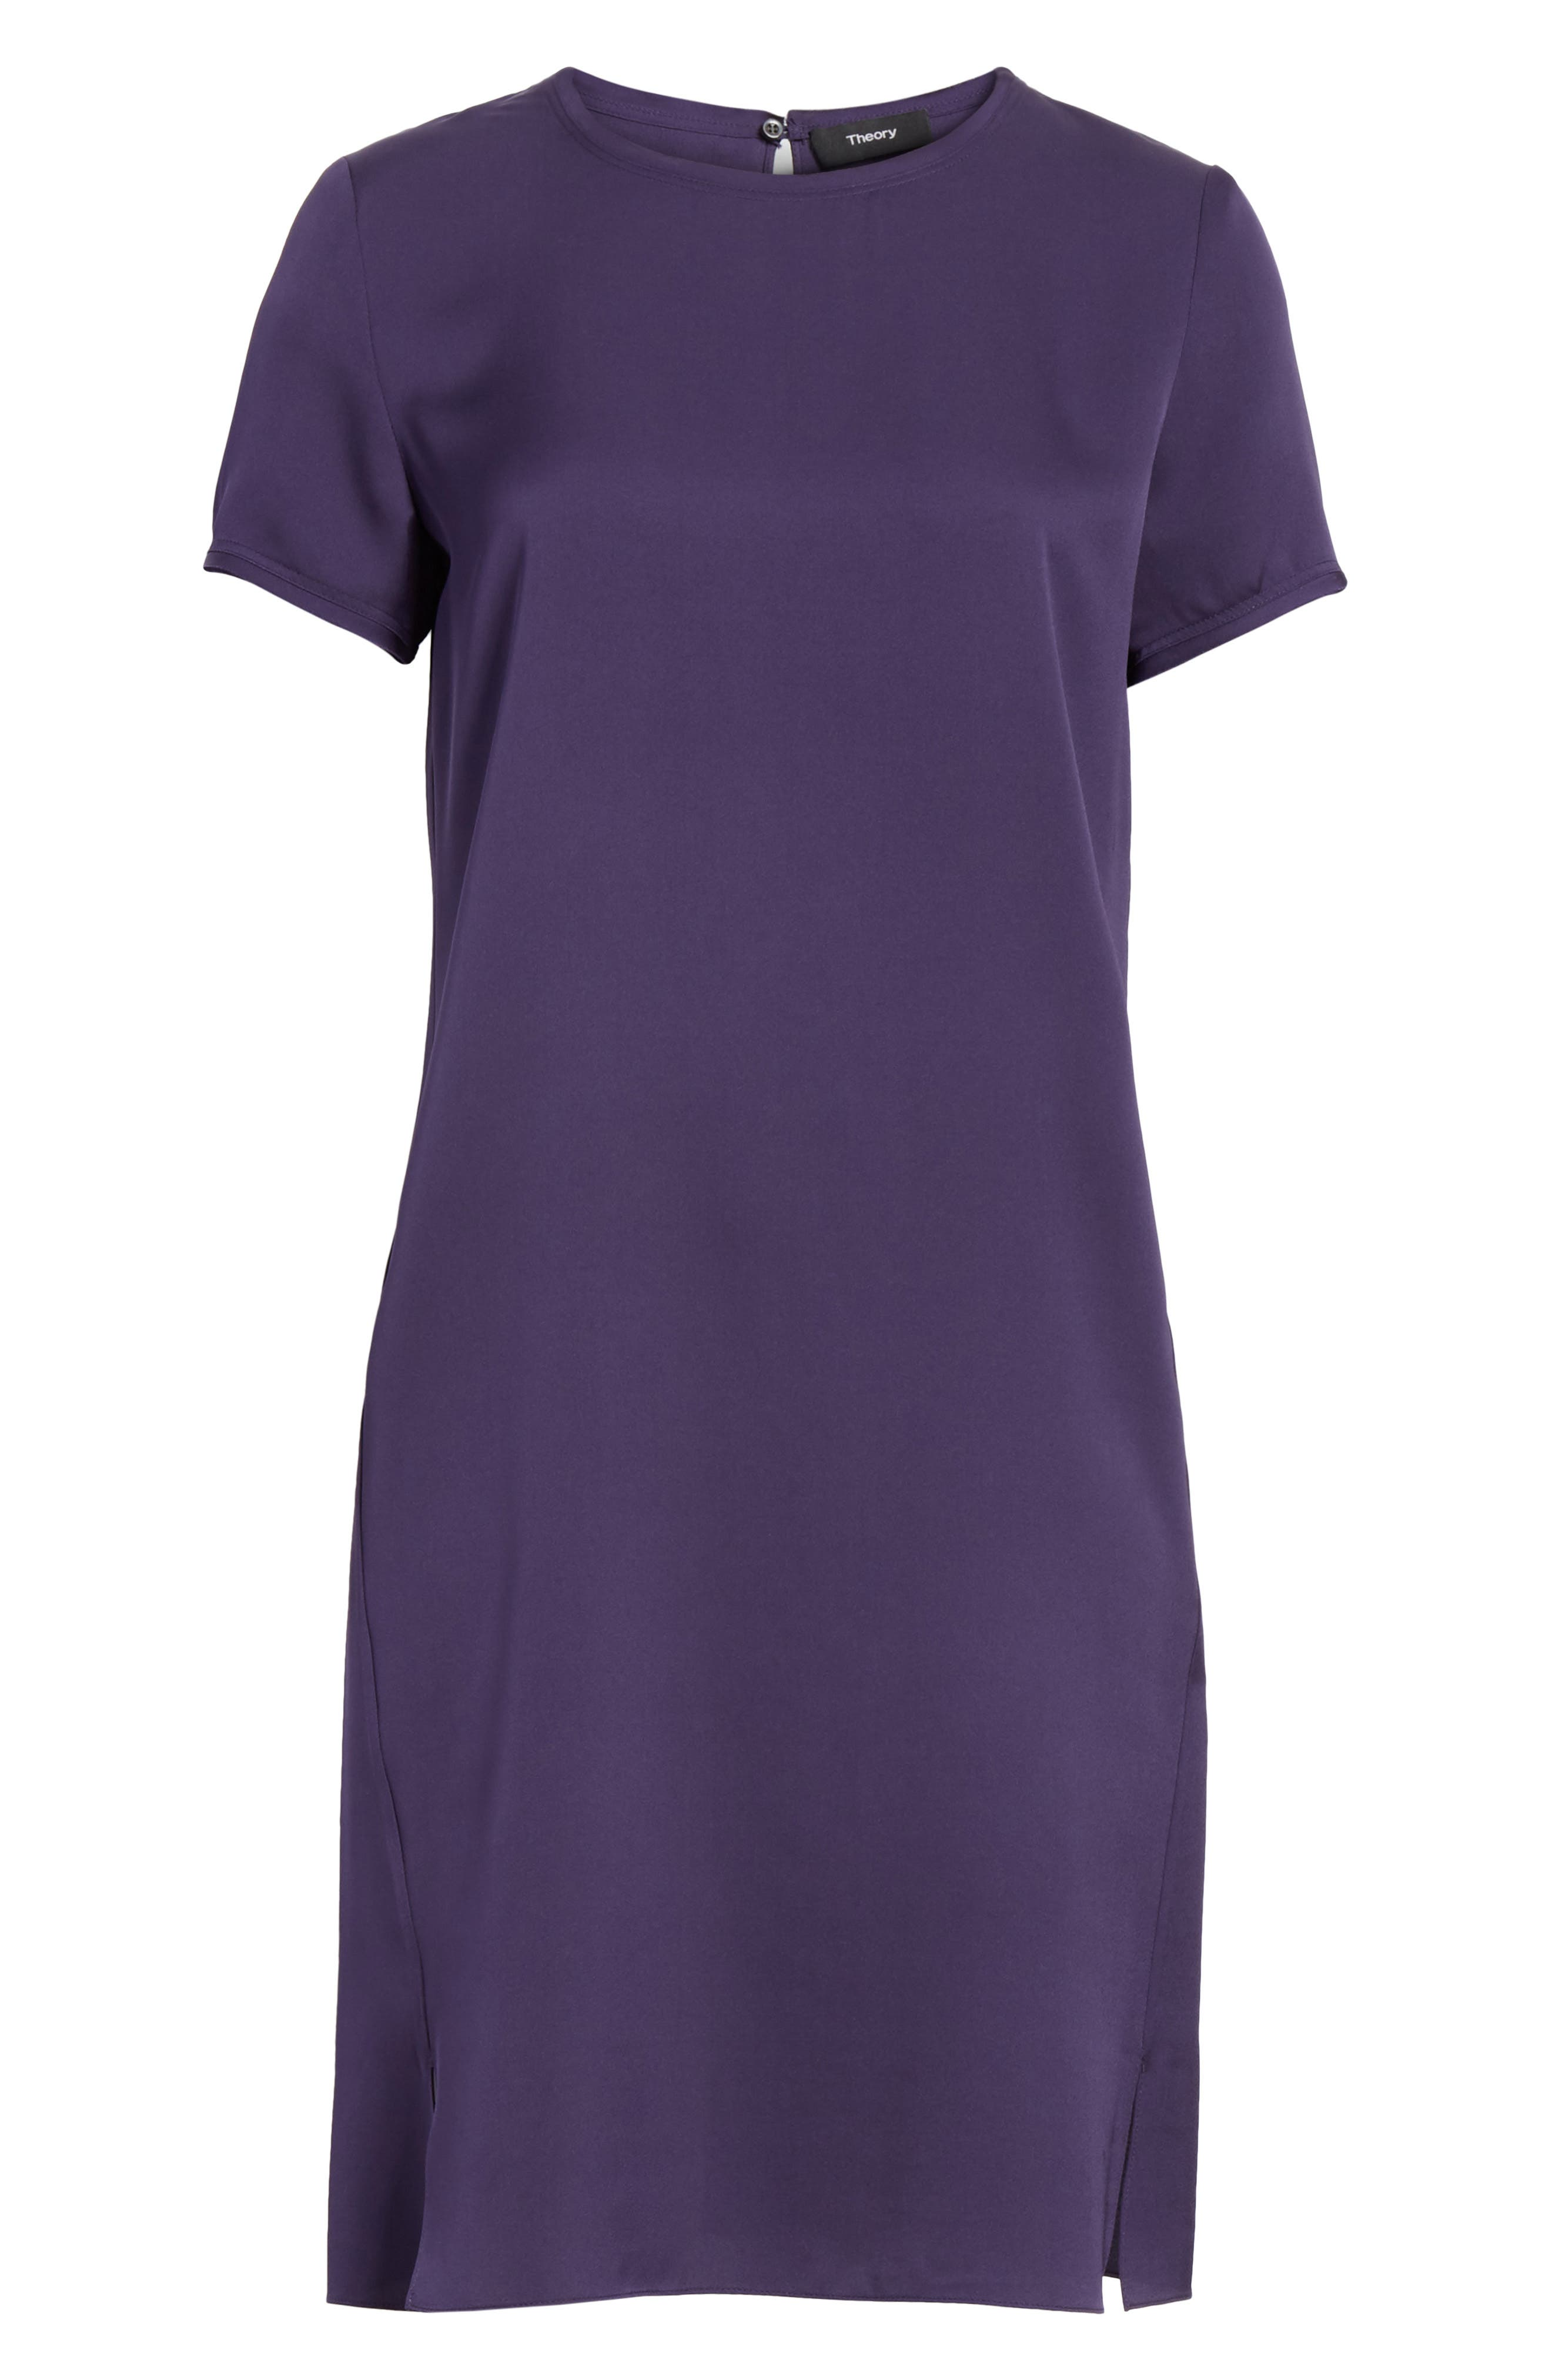 Modern Silk T-Shirt Dress,                             Alternate thumbnail 6, color,                             Plum Purple